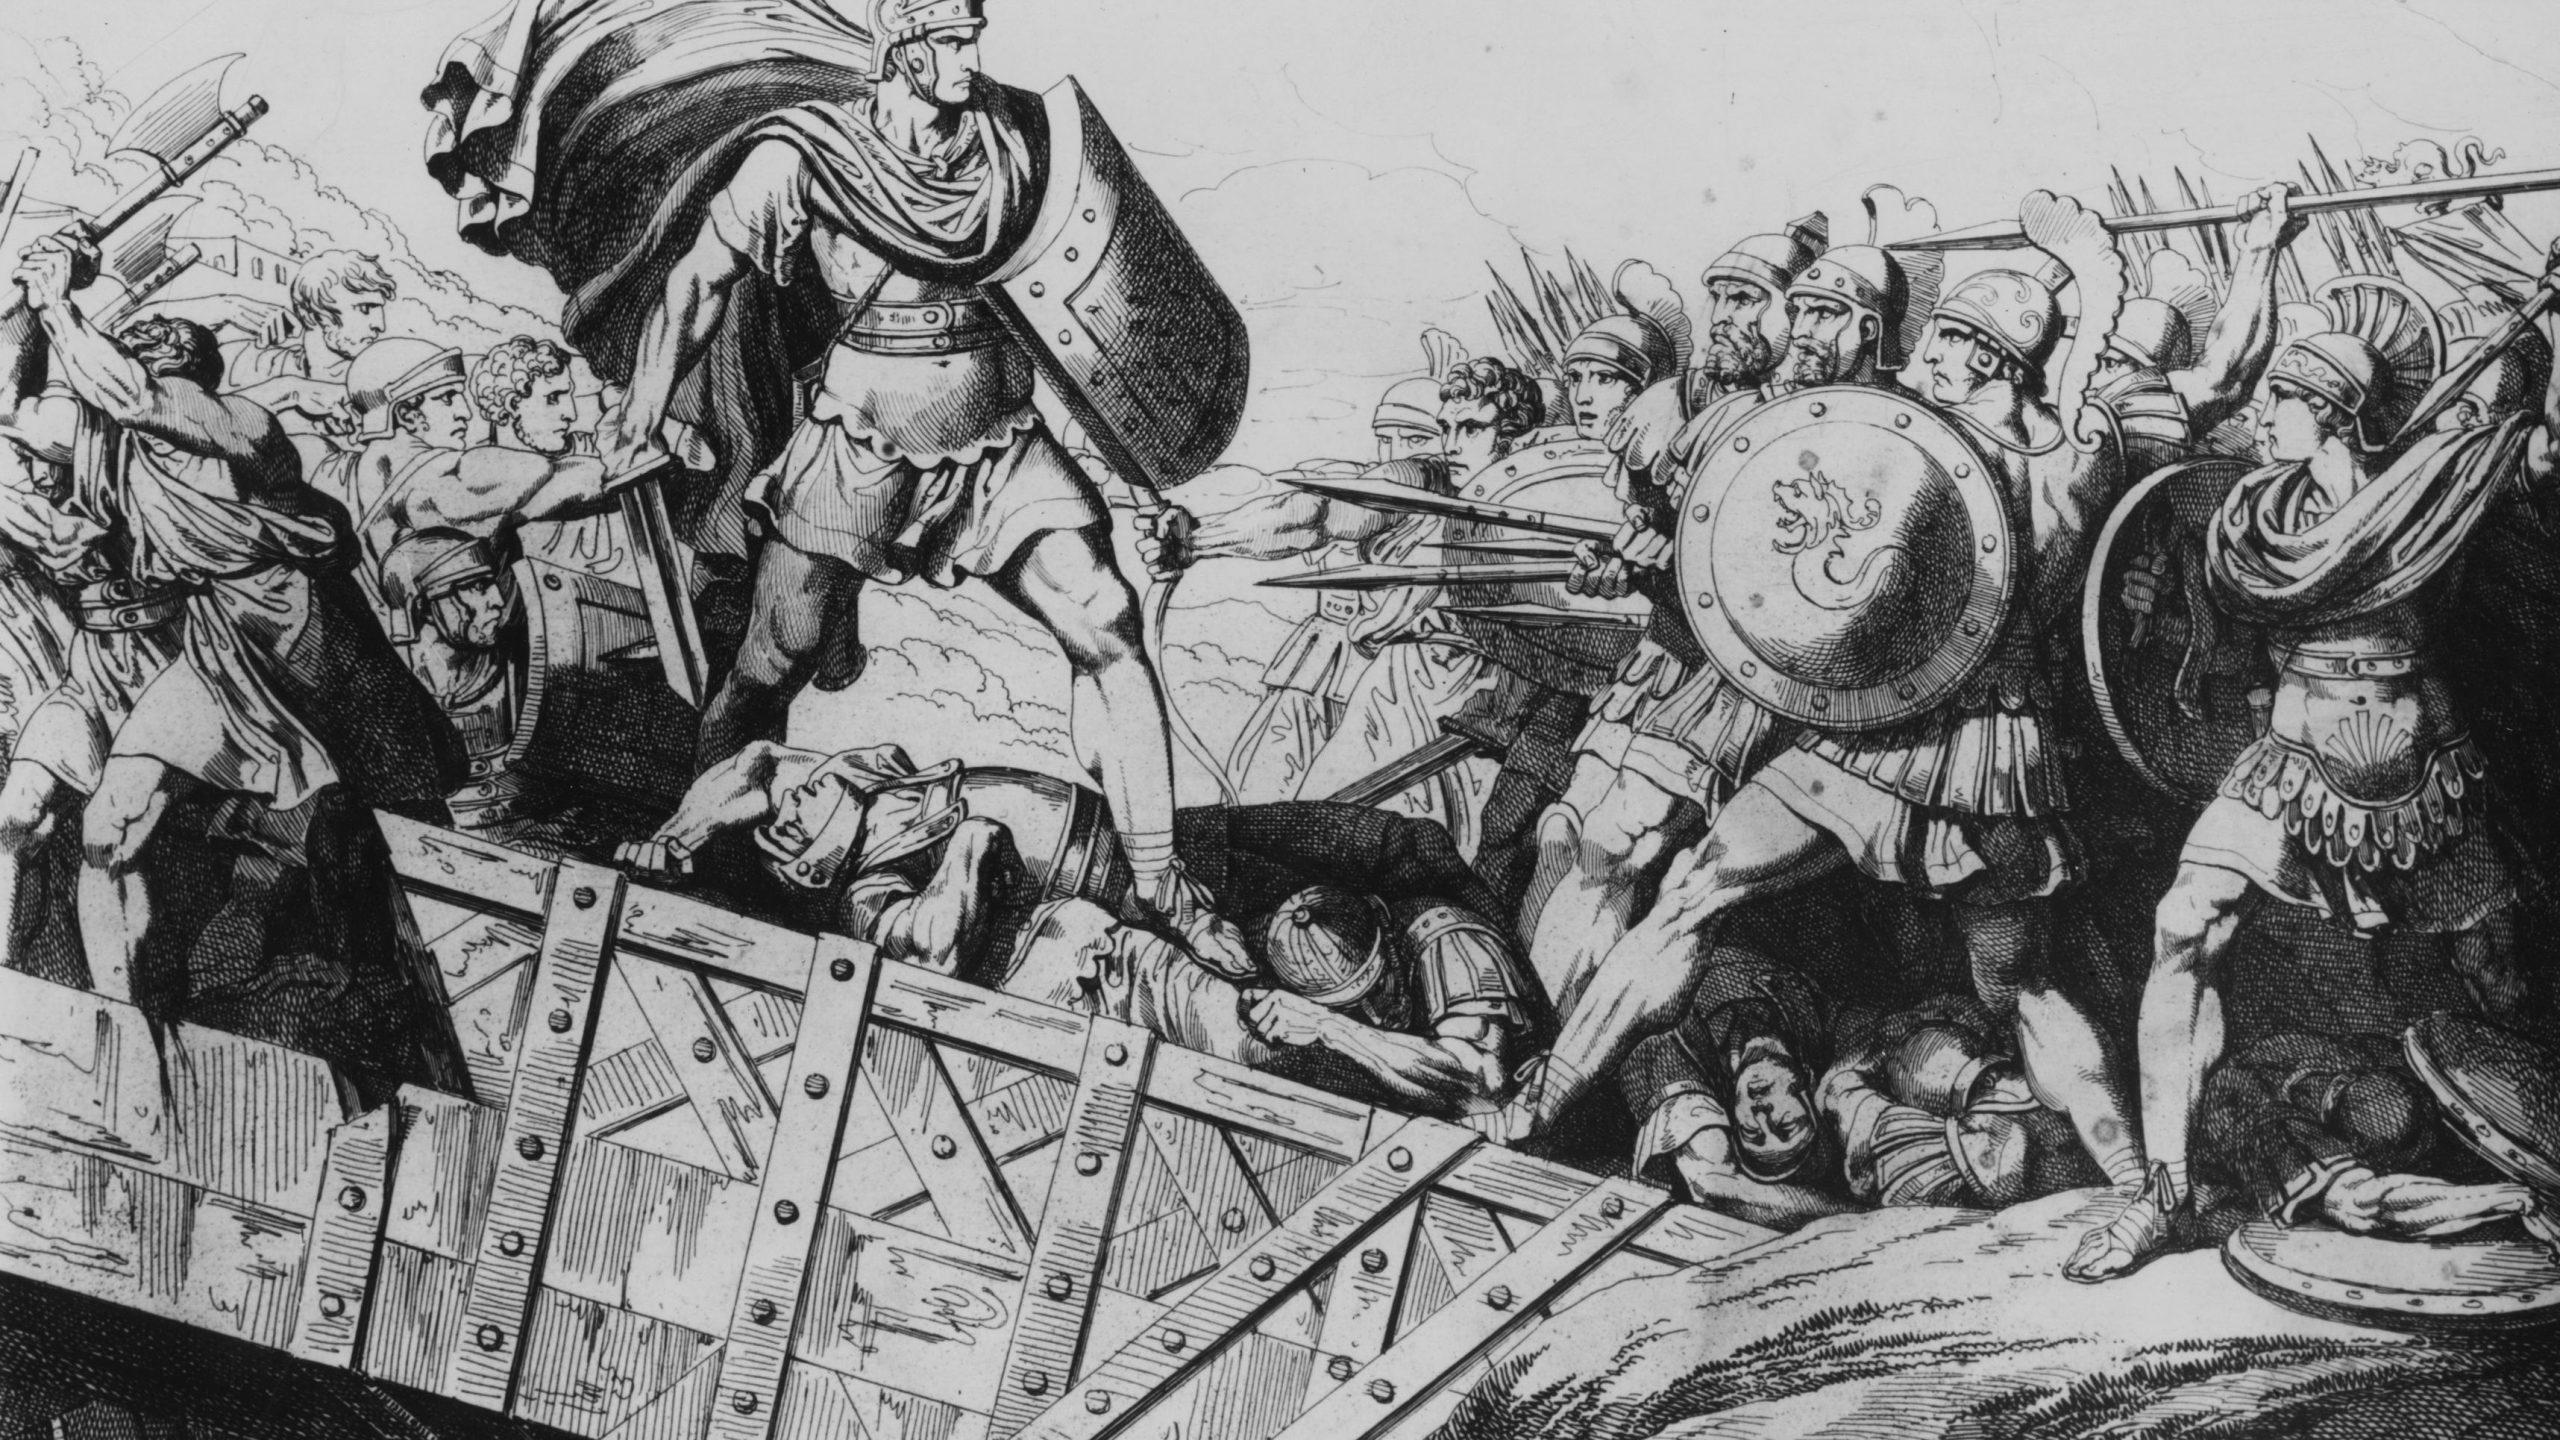 Horatius at the Bridge: Man or Myth?